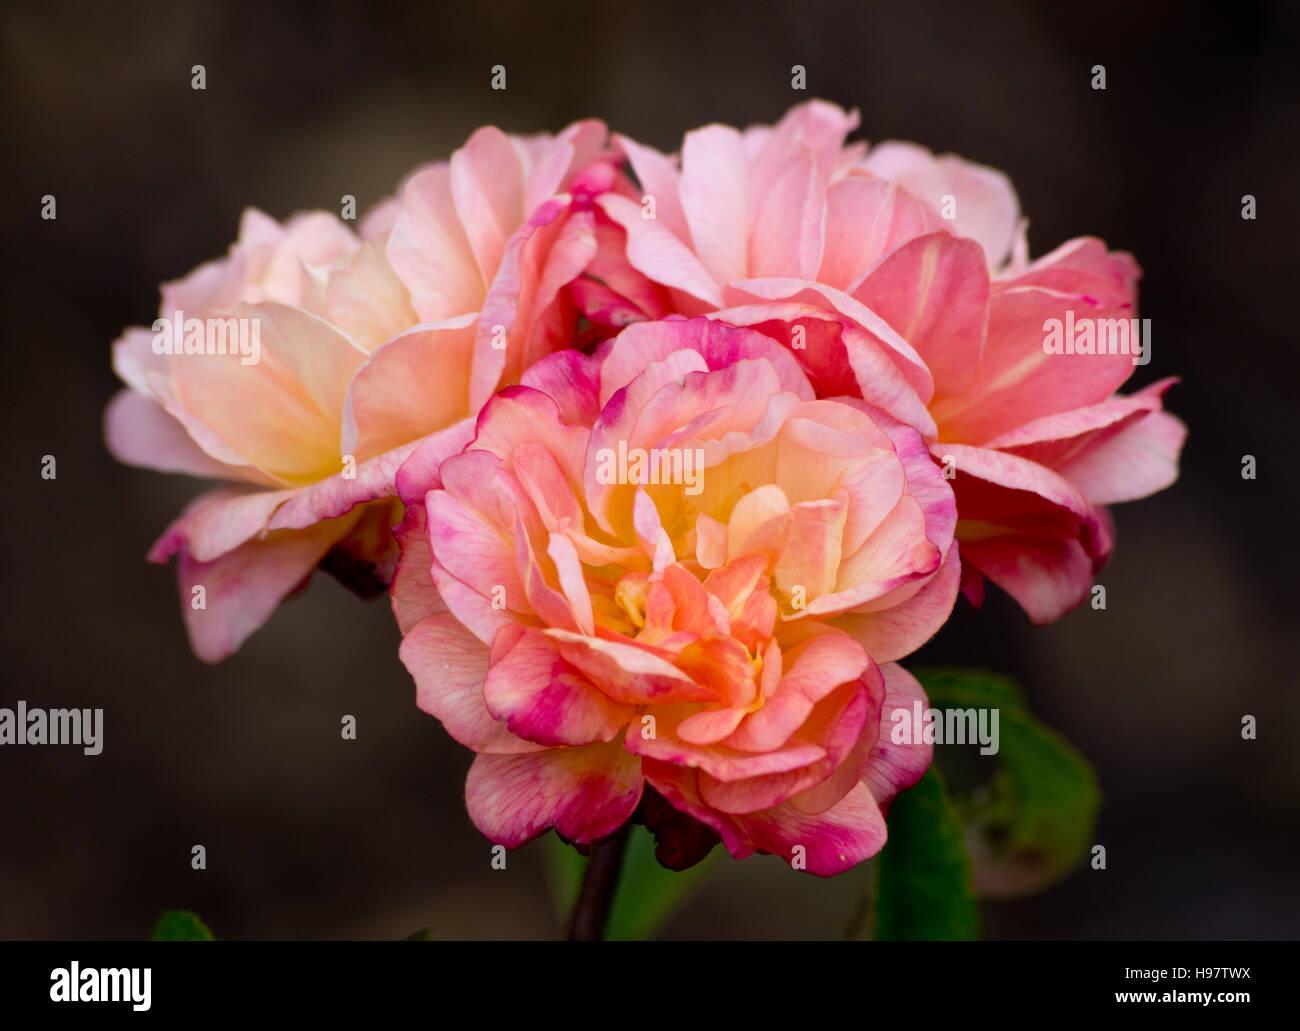 Rose Souvenir Leonie Viennot - Stock Image